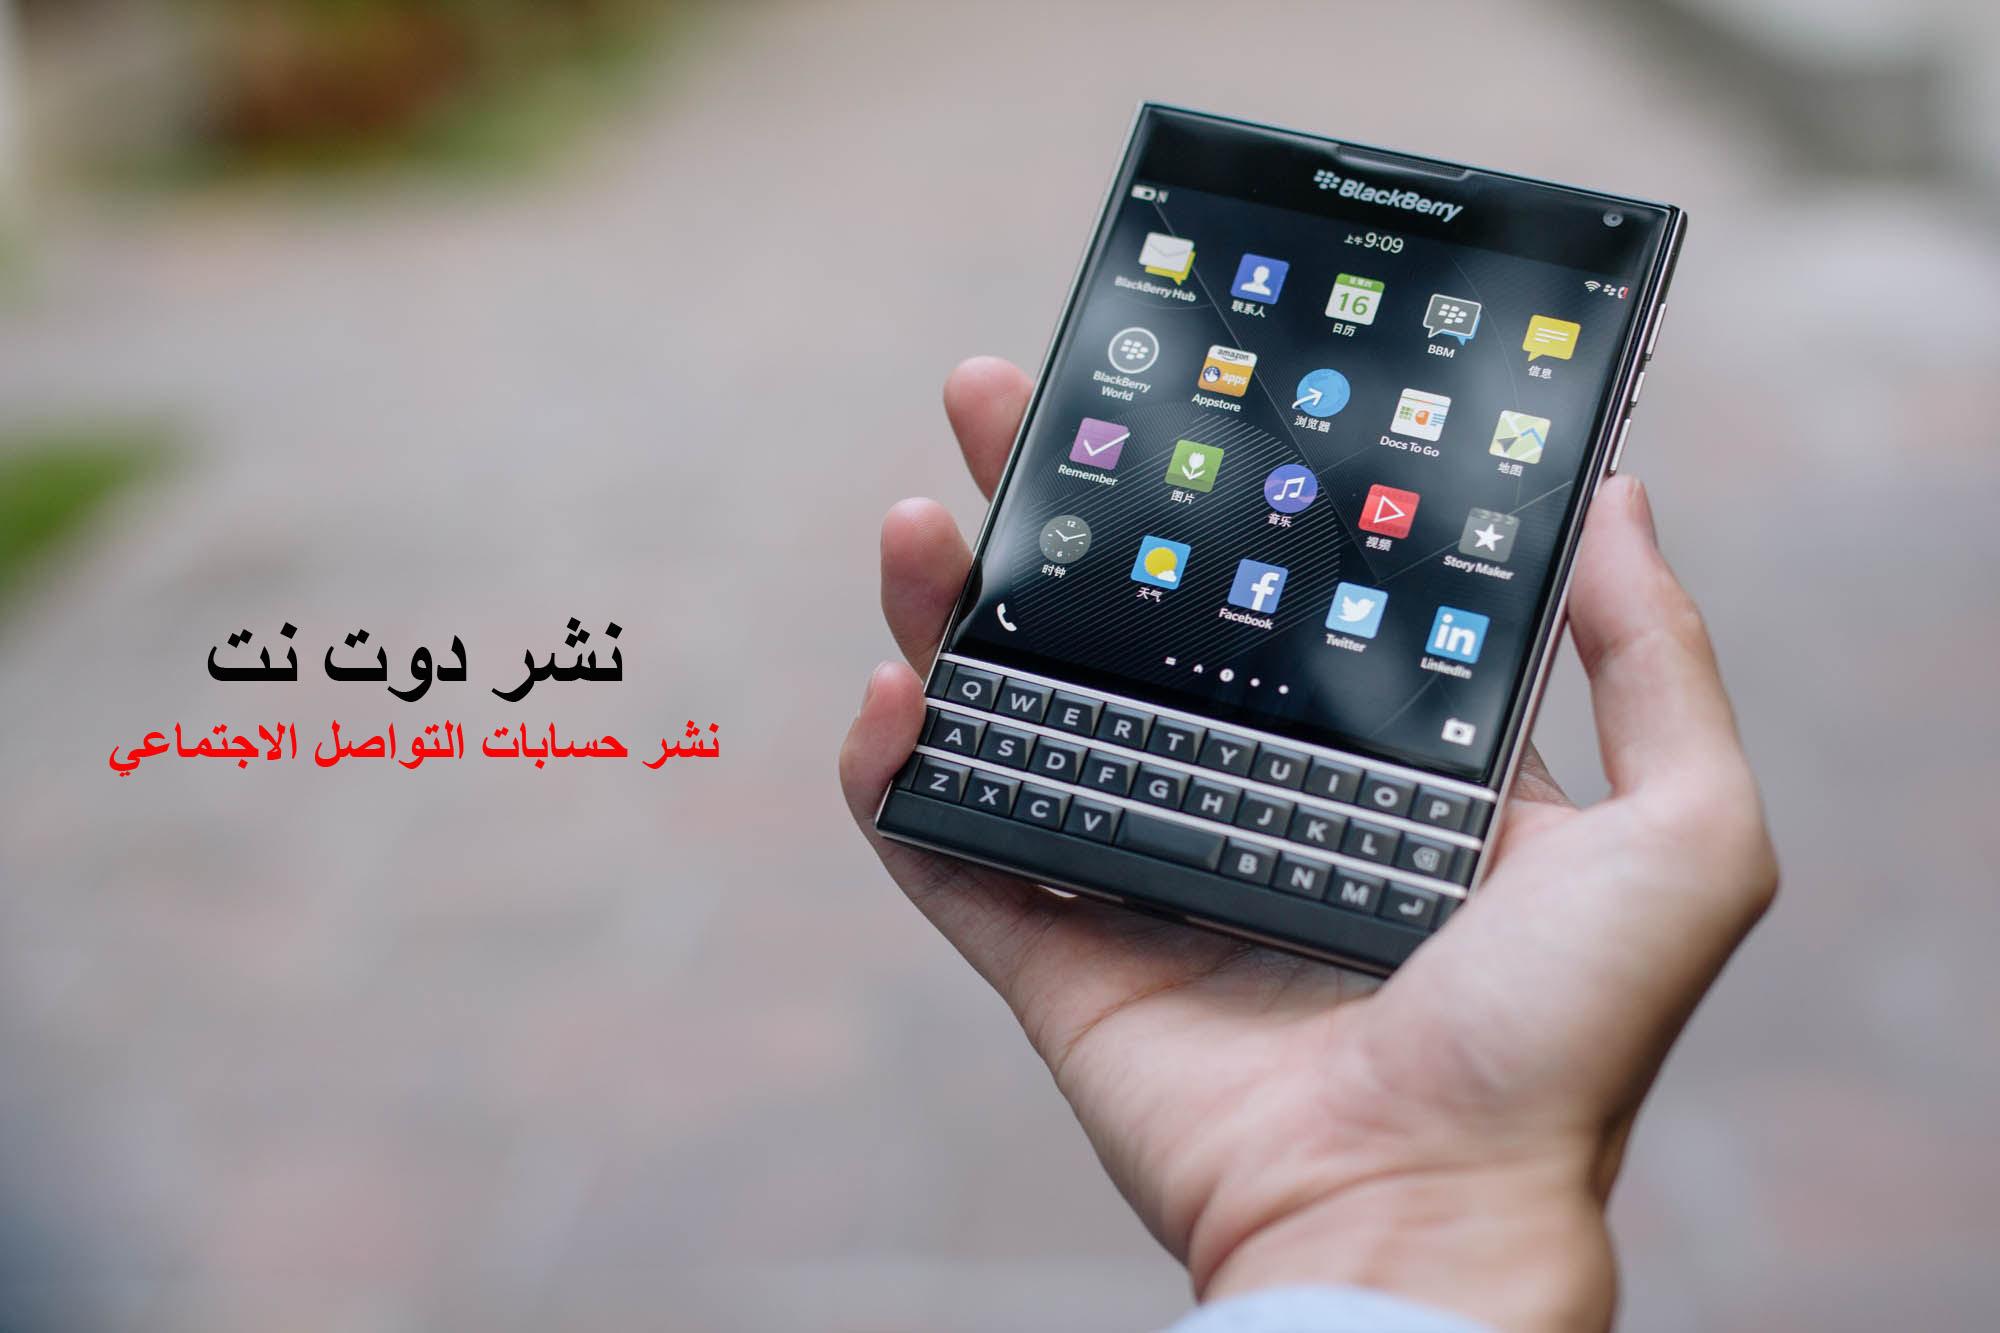 تعارف-بلاك-بيري-BlackBerry-OS